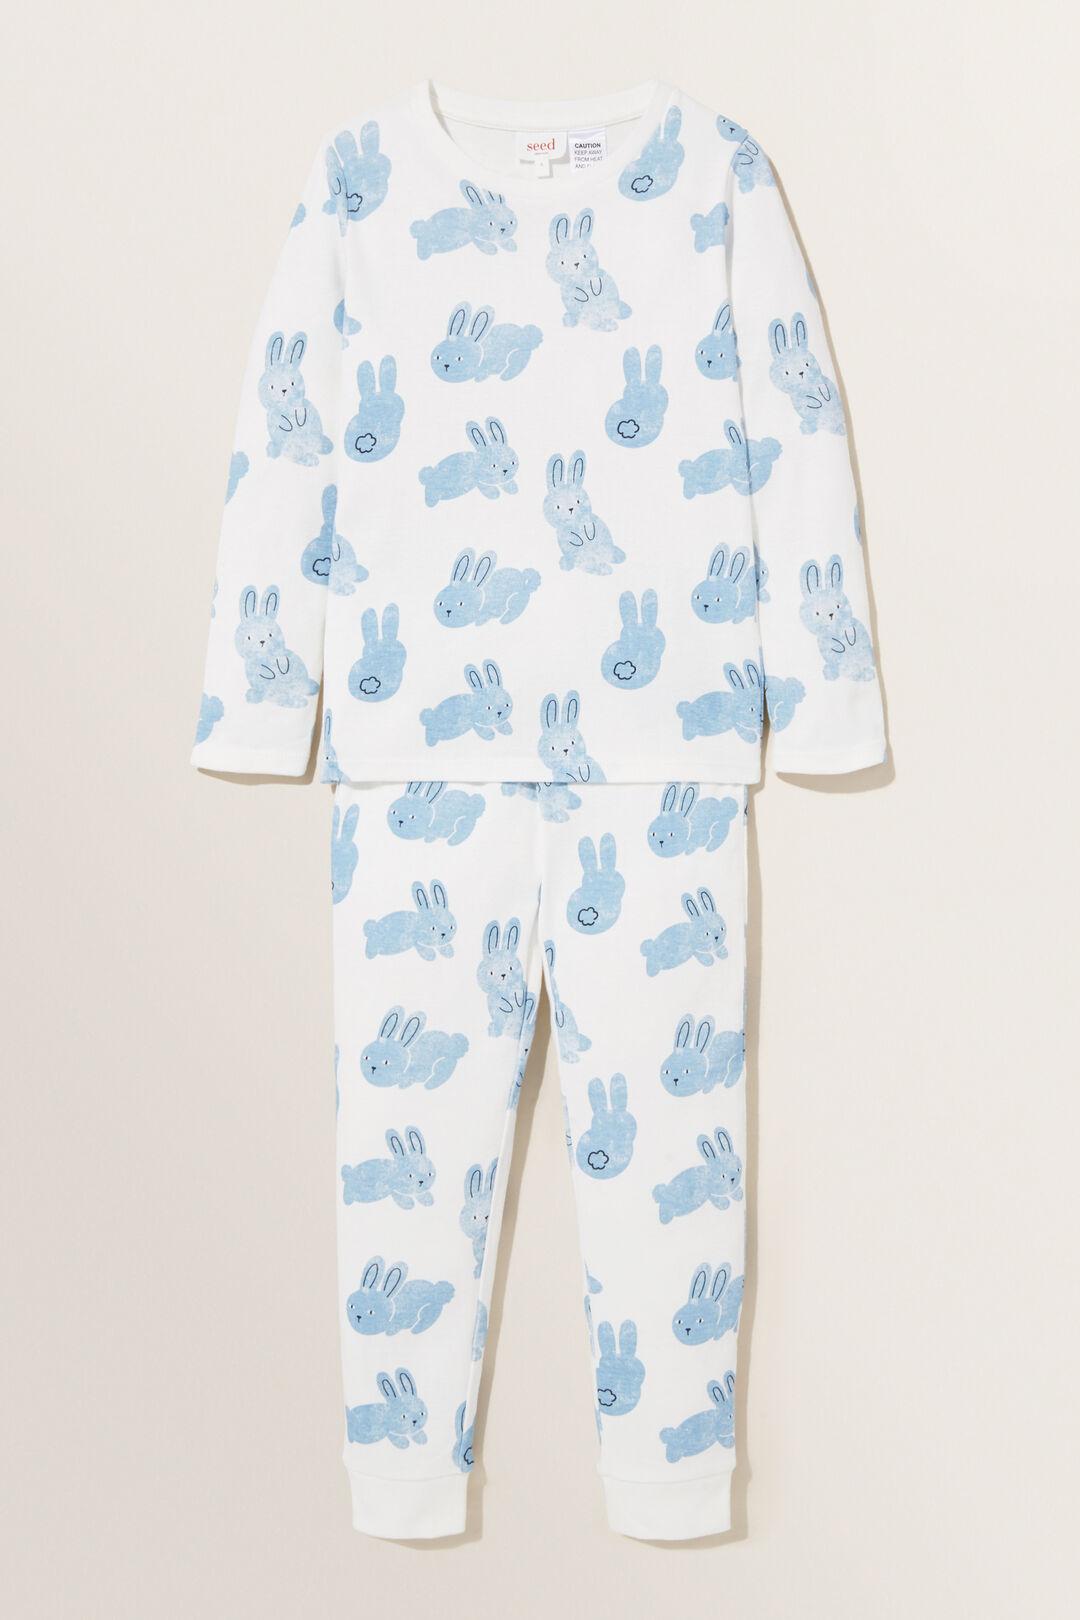 Blue Bunny Long Sleeve  Pyjamas  ARCTIC BLUE  hi-res